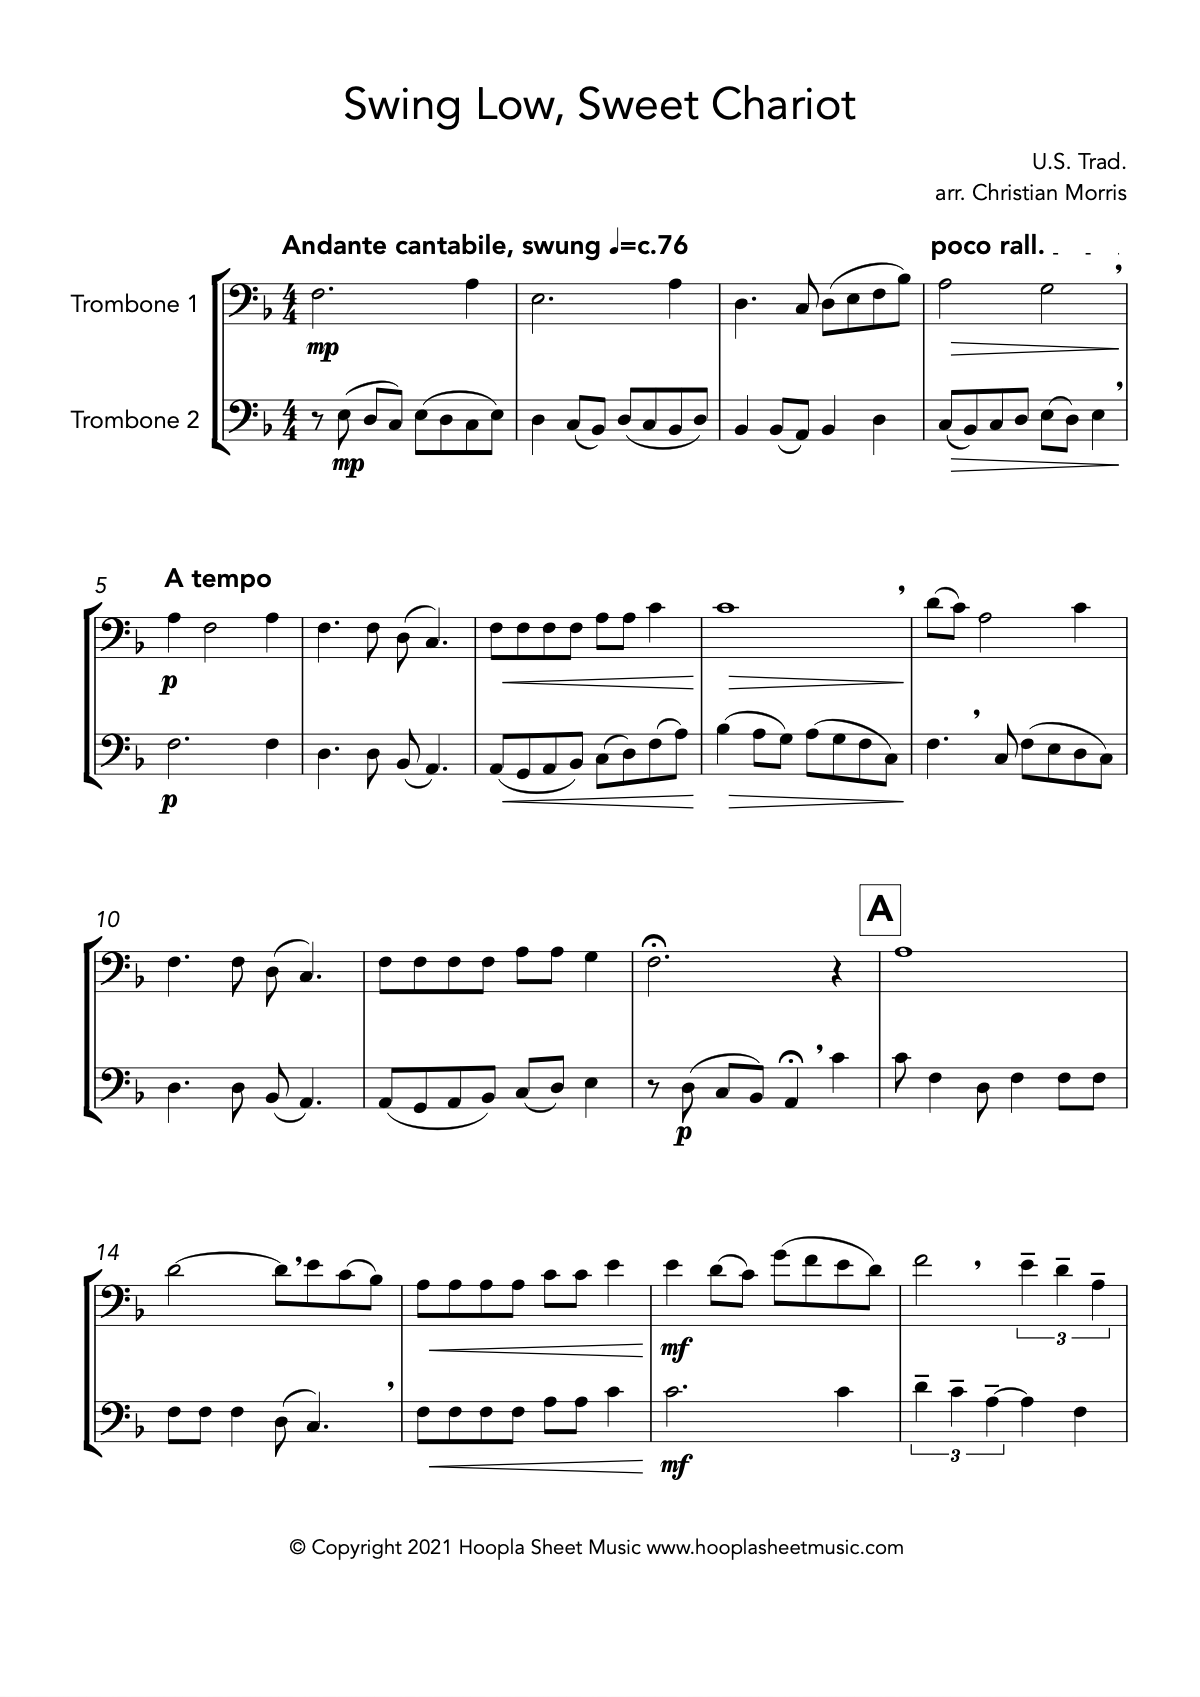 Swing Low, Sweet Chariot (Trombone Duet)